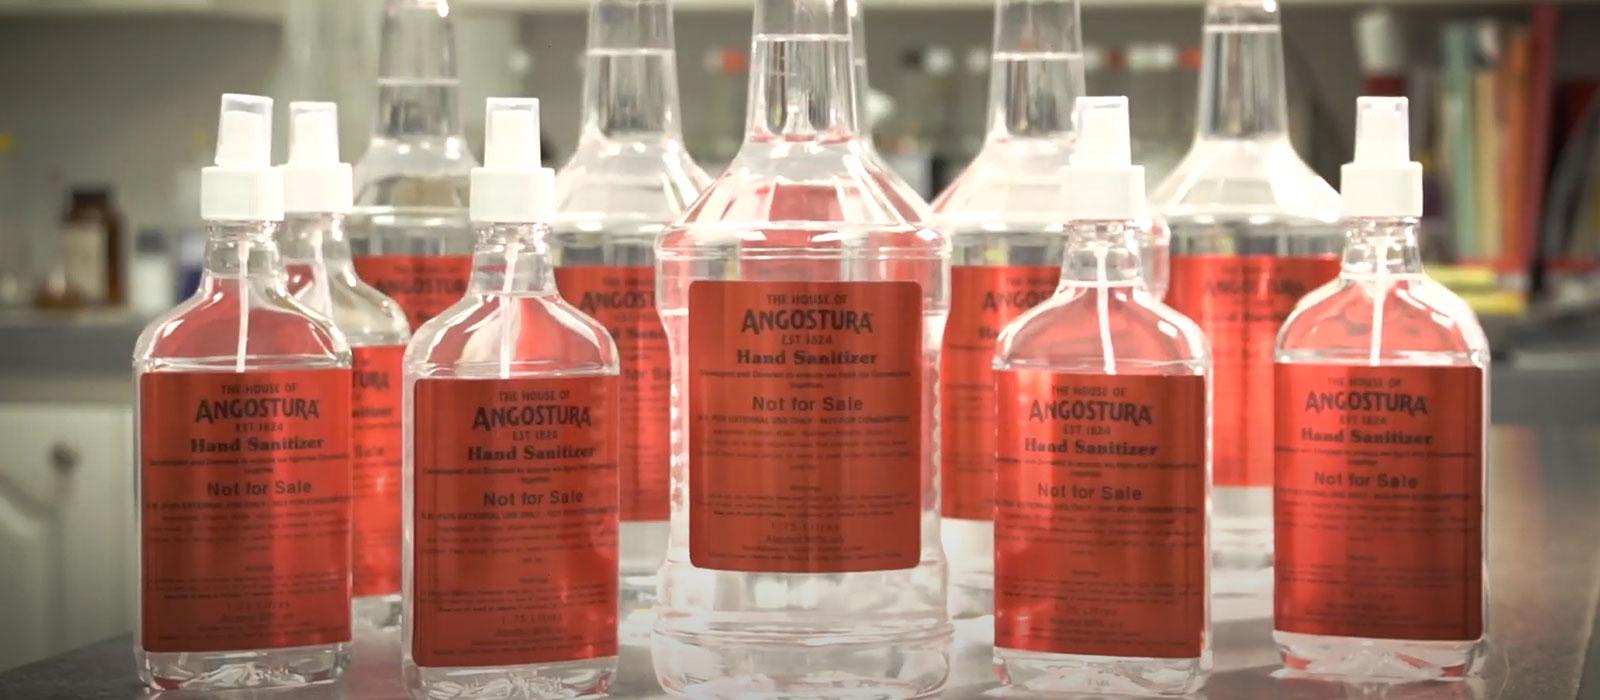 Sjunde plats 2020: Angostura Hand Sanitizer